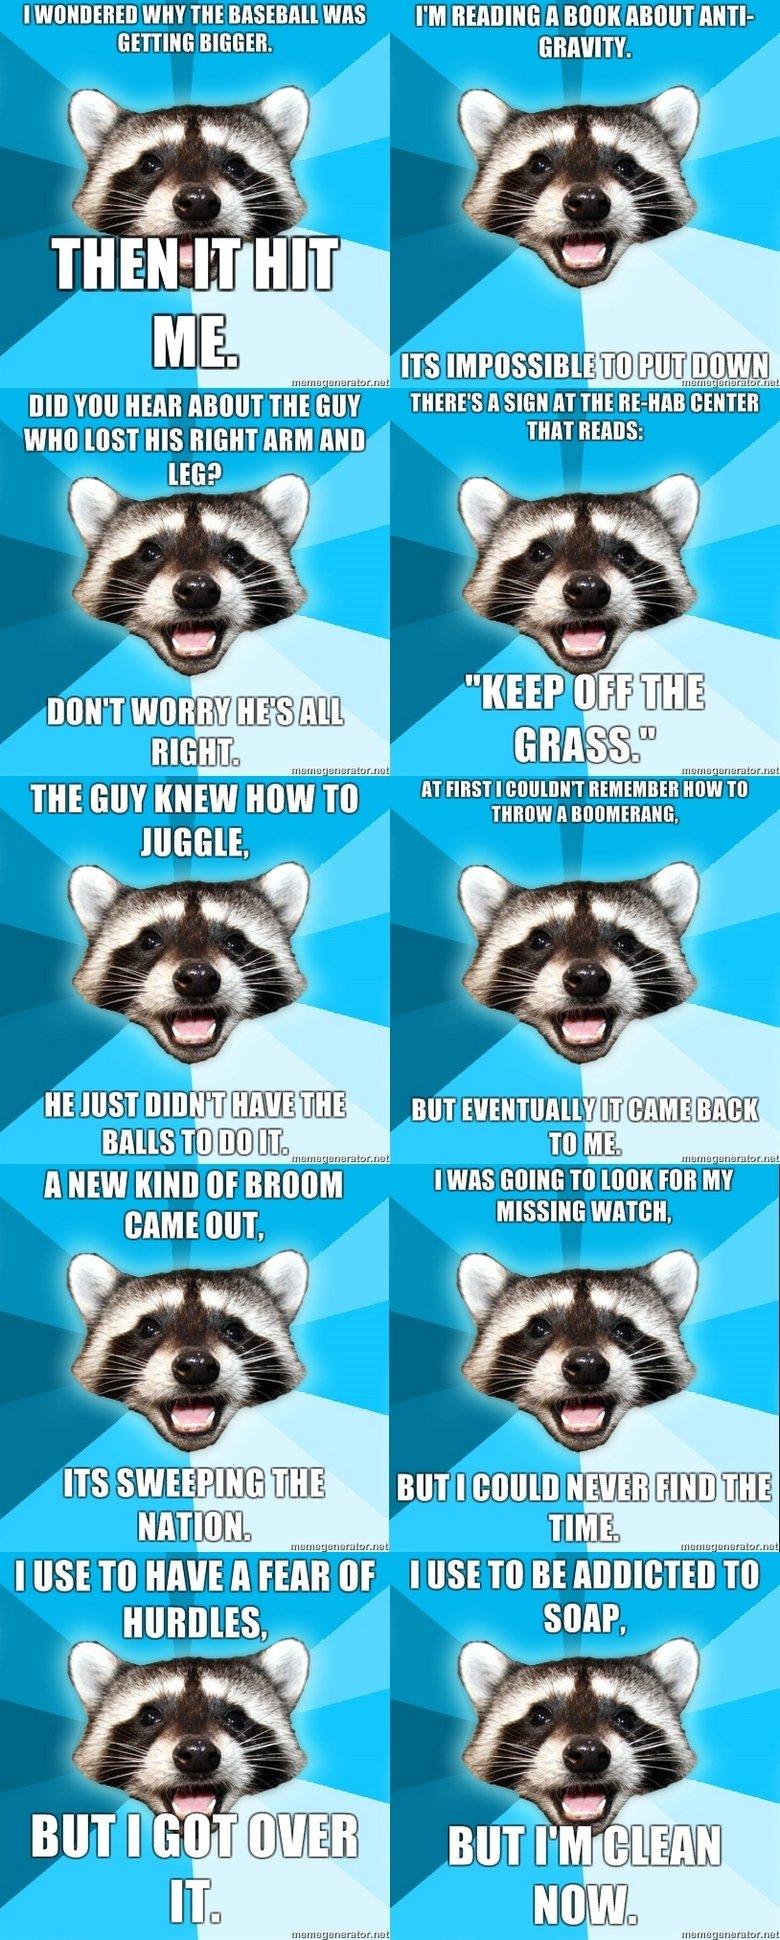 "Lame Pun Raccoon comp. OC, made all of these on memegenerator.net. I wannan WHY THEE Mu. I' M Bonn 115001 mm- Bail m THERE' S ll ""fl HT THE miimii"" miimii I up"